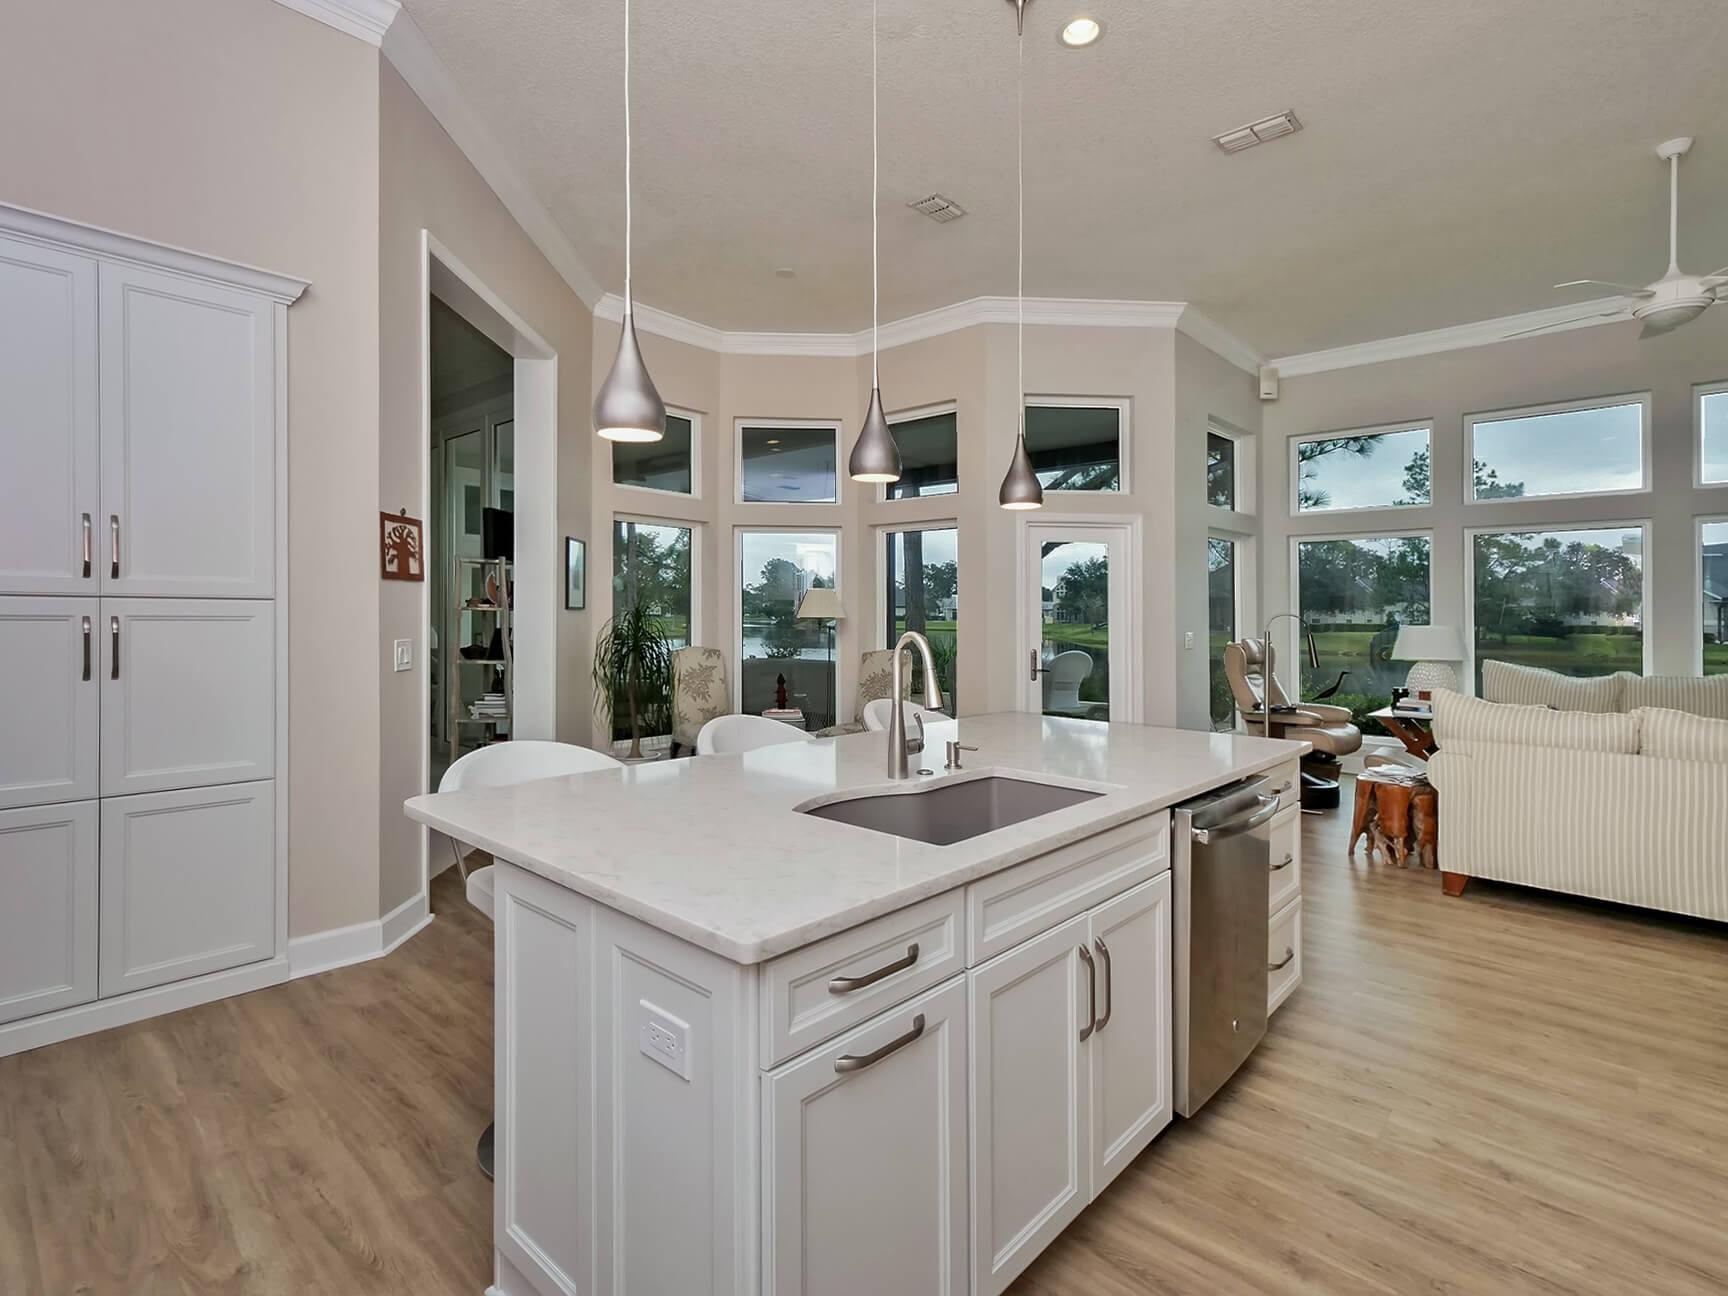 JGCC Kitchen and Bath Remodel